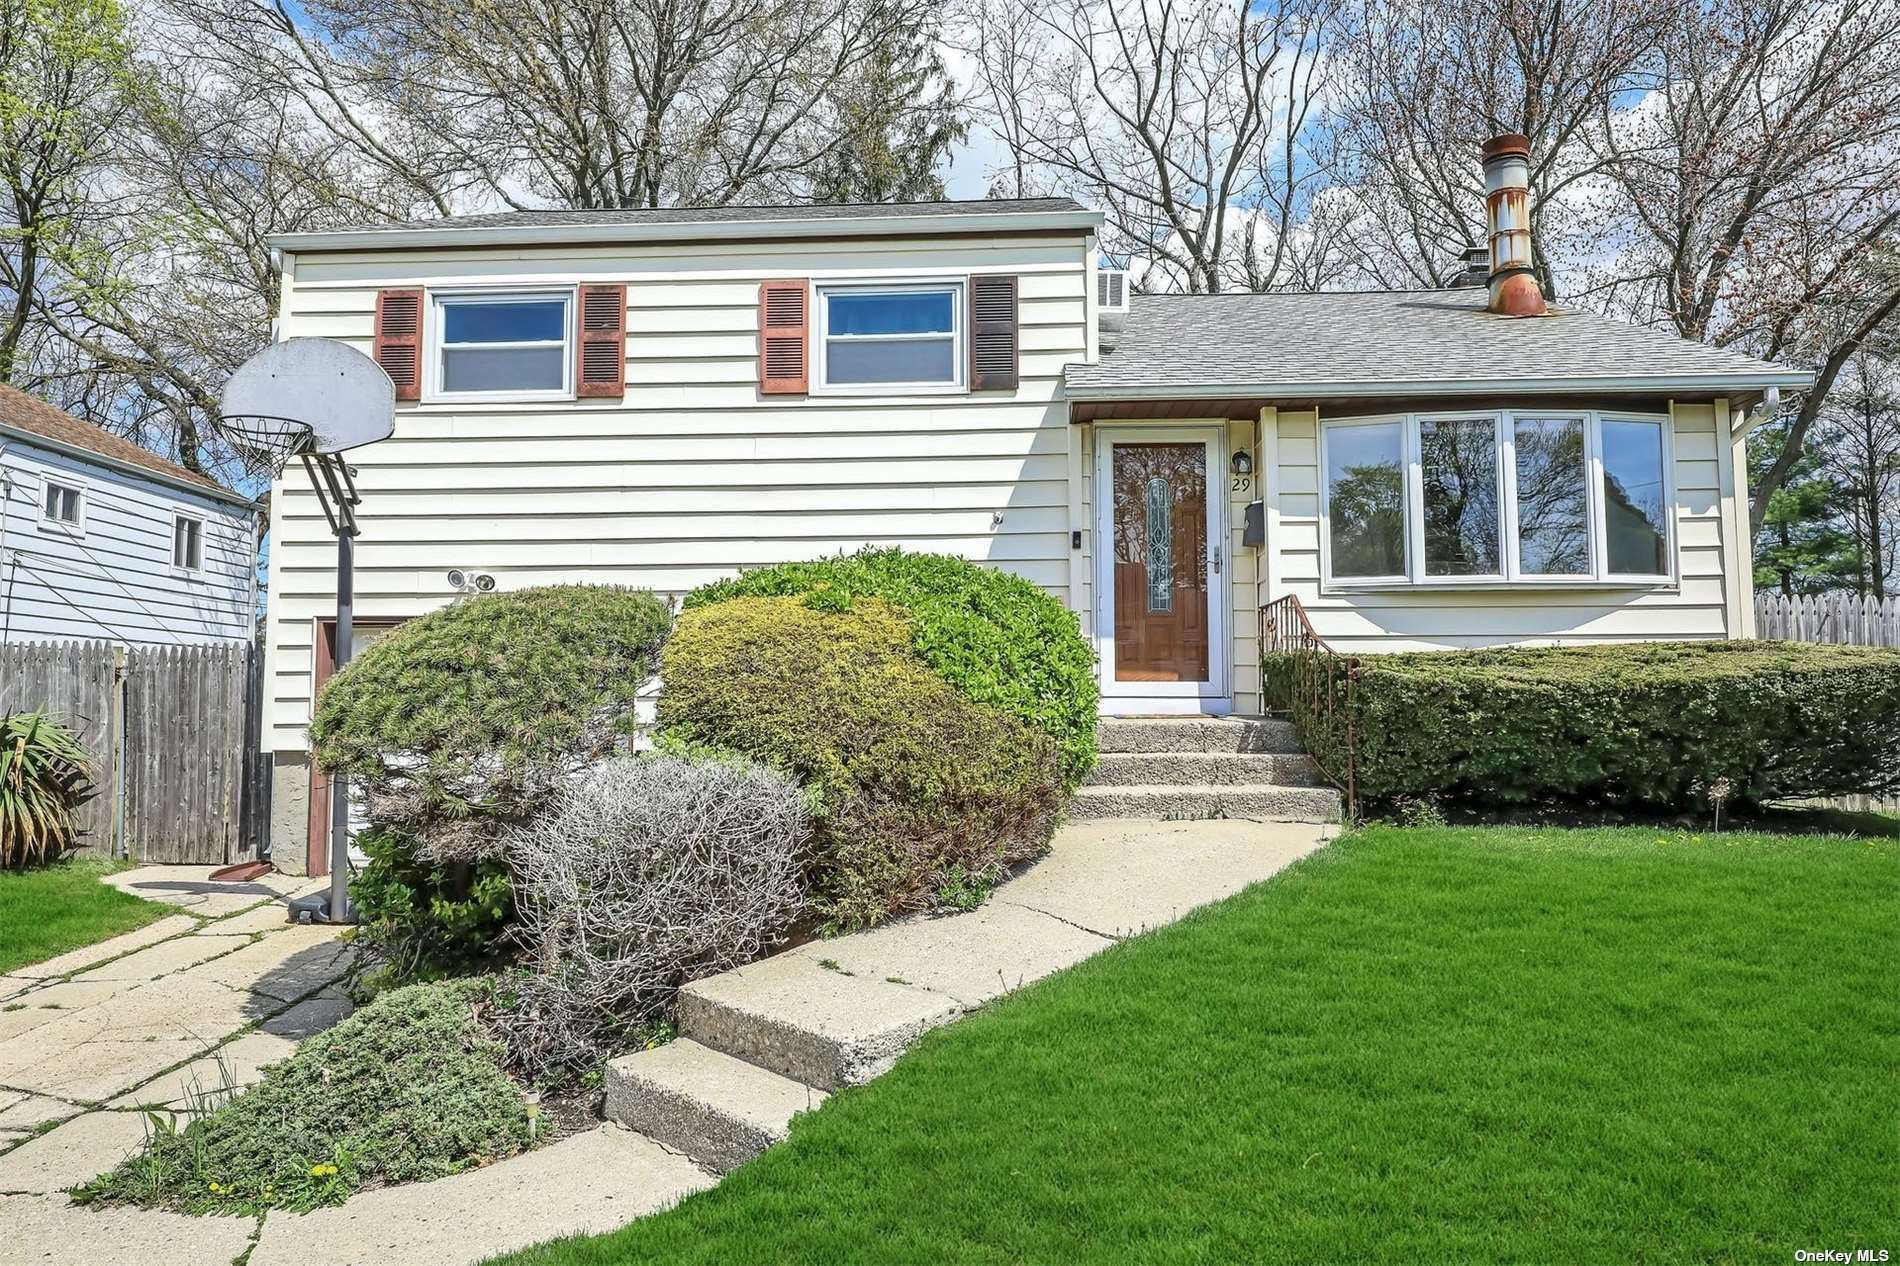 29 Briarwood Lane, Plainview, NY 11803 - MLS#: 3305356